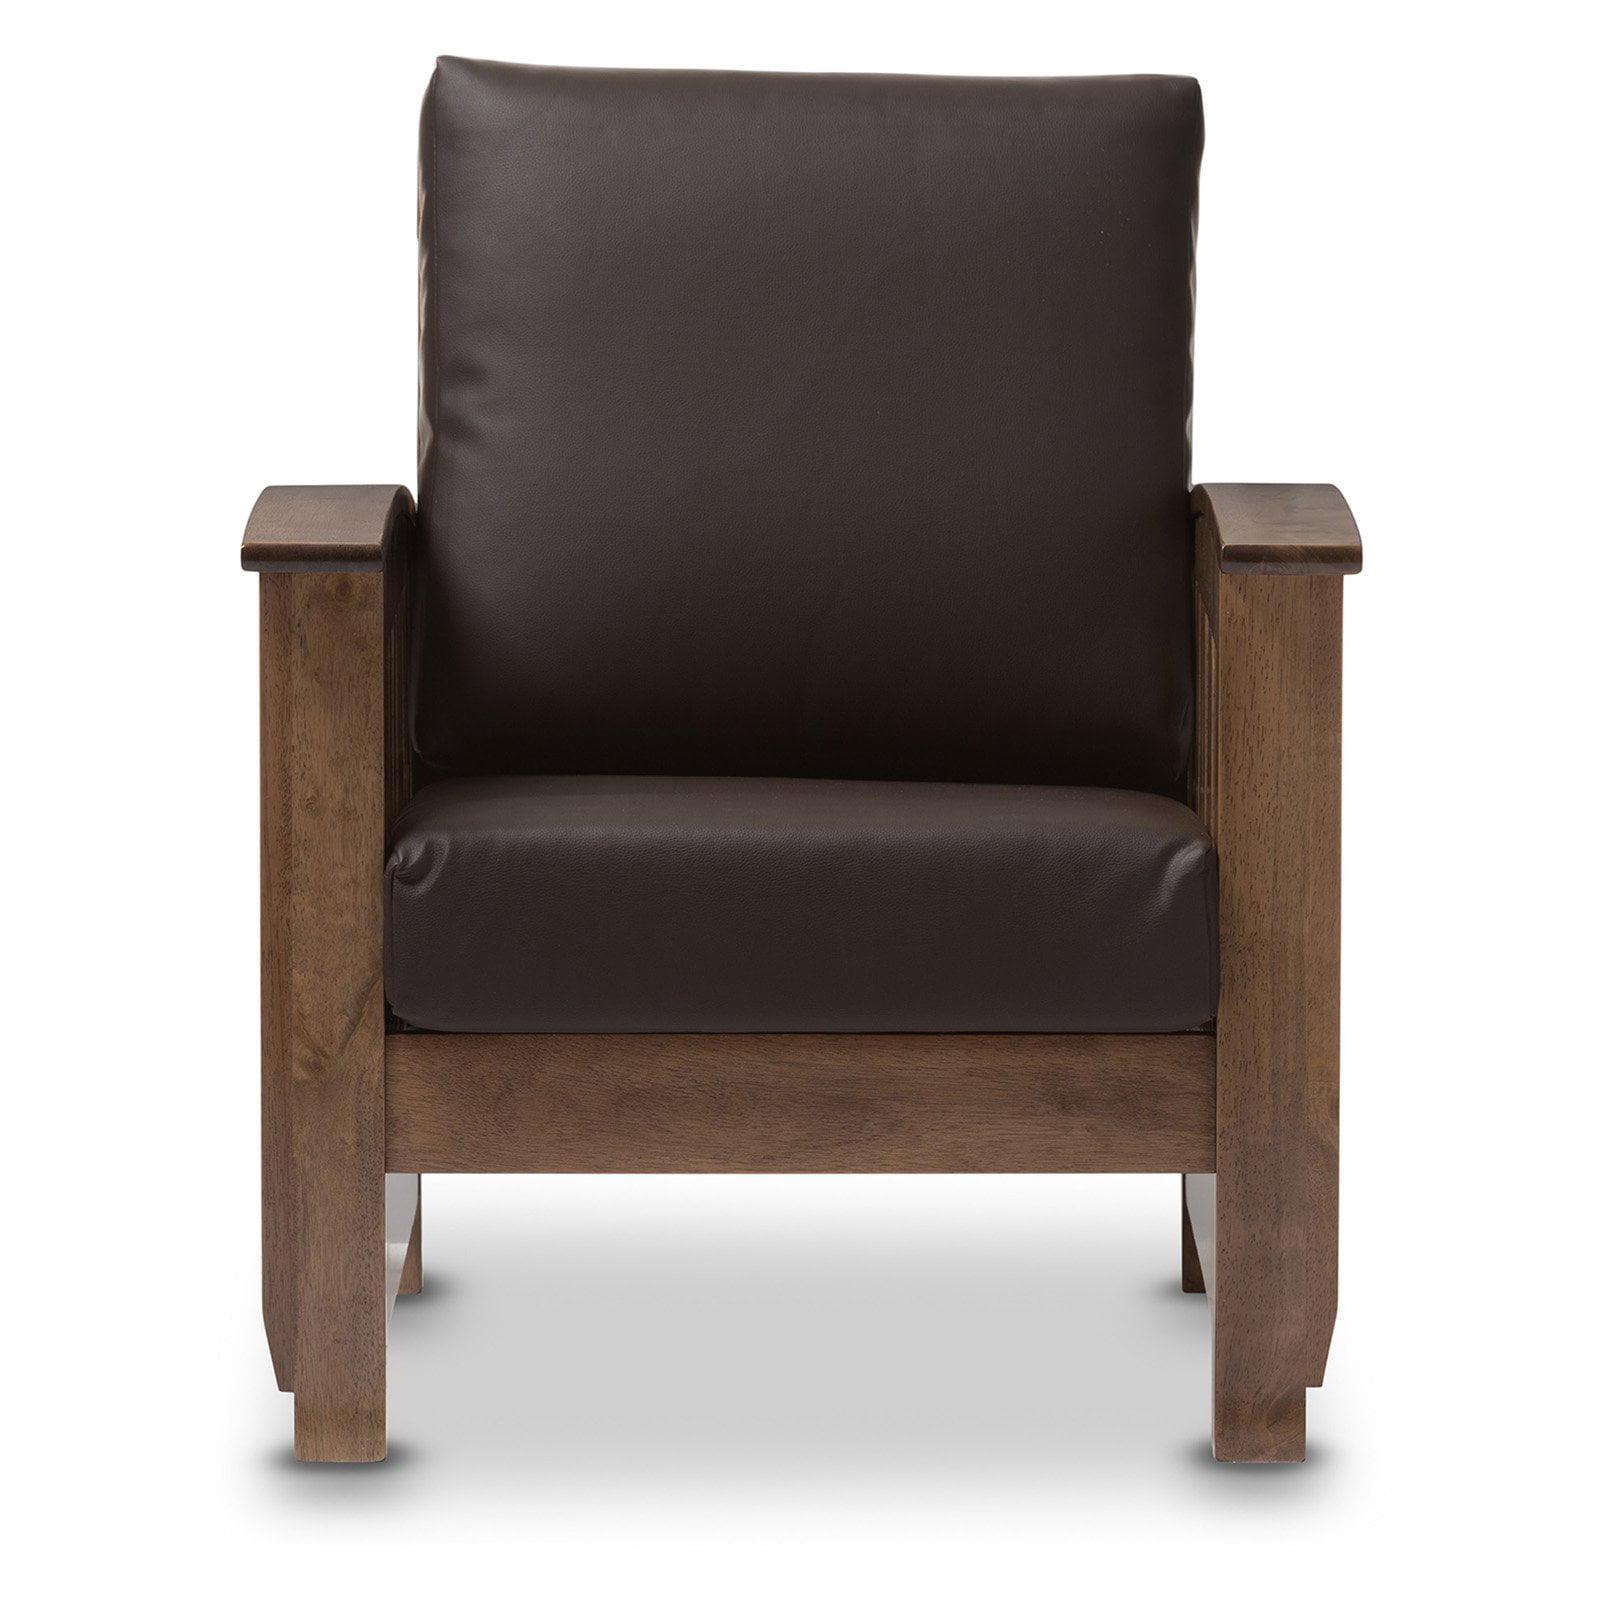 Baxton Studio Charlotte Lounge Chair by Baxton Studio